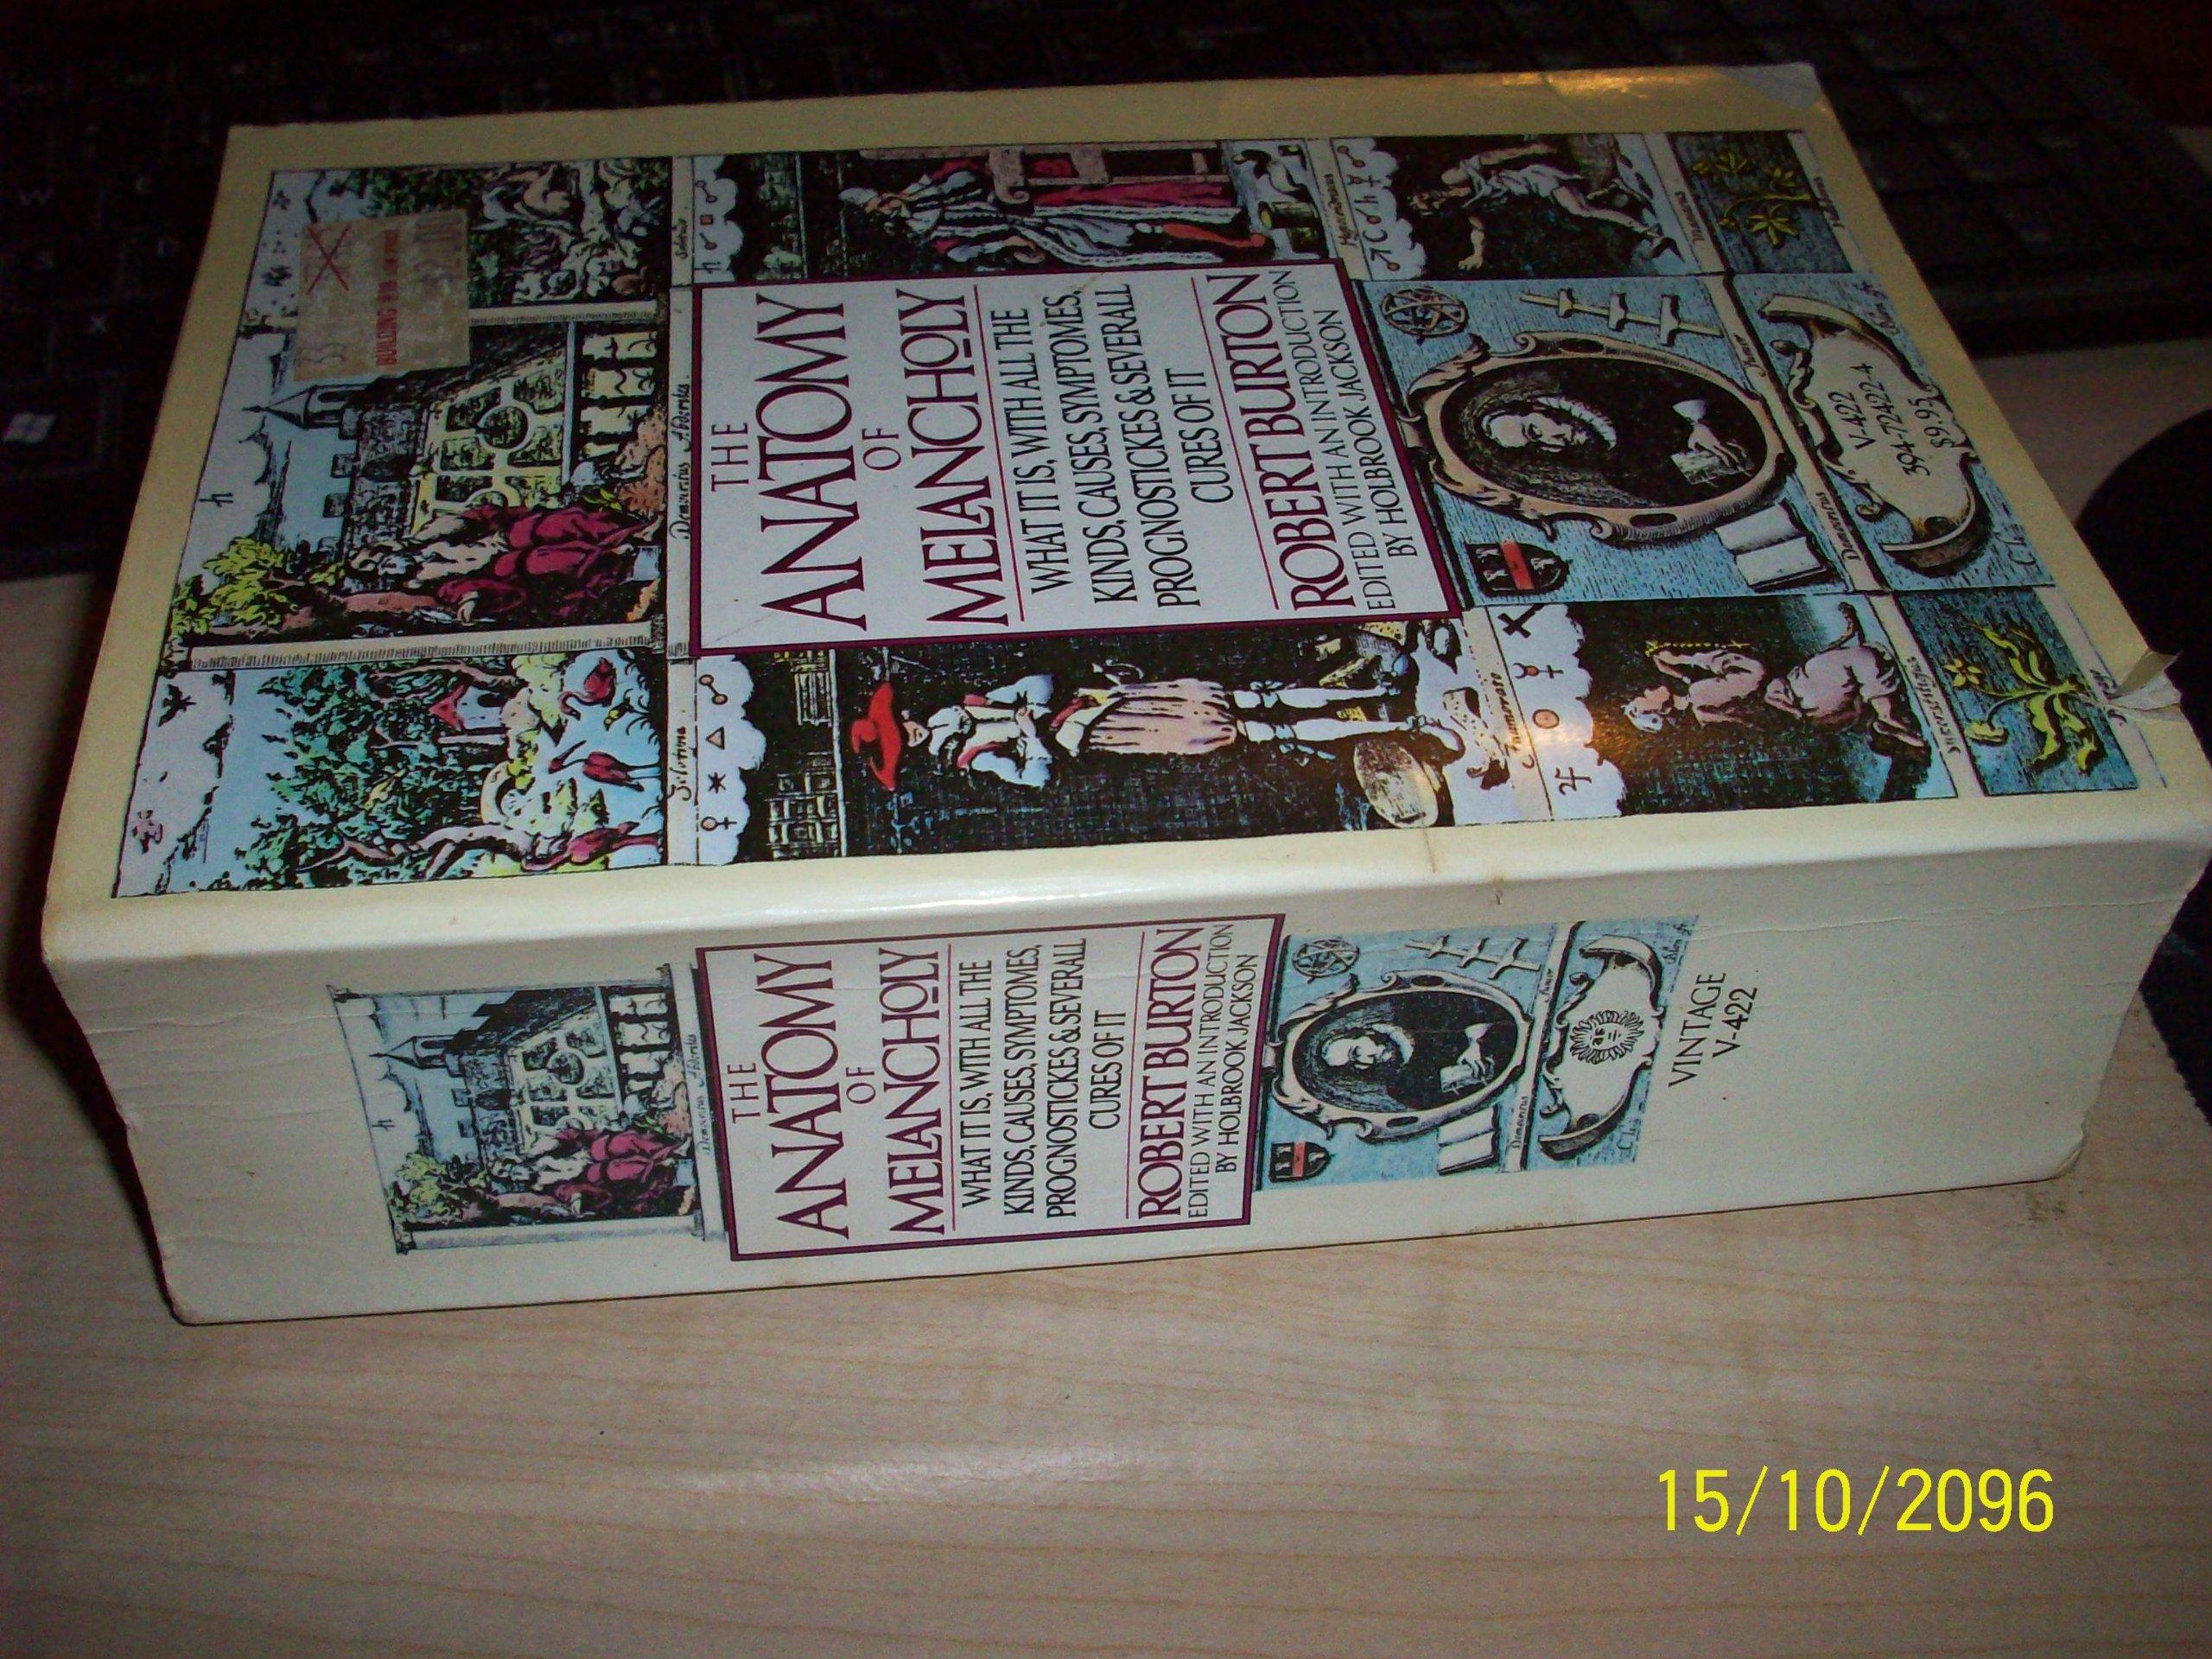 V422 ANATOMY MELANCHOLY: Robert Burton: 9780394724225: Amazon.com: Books